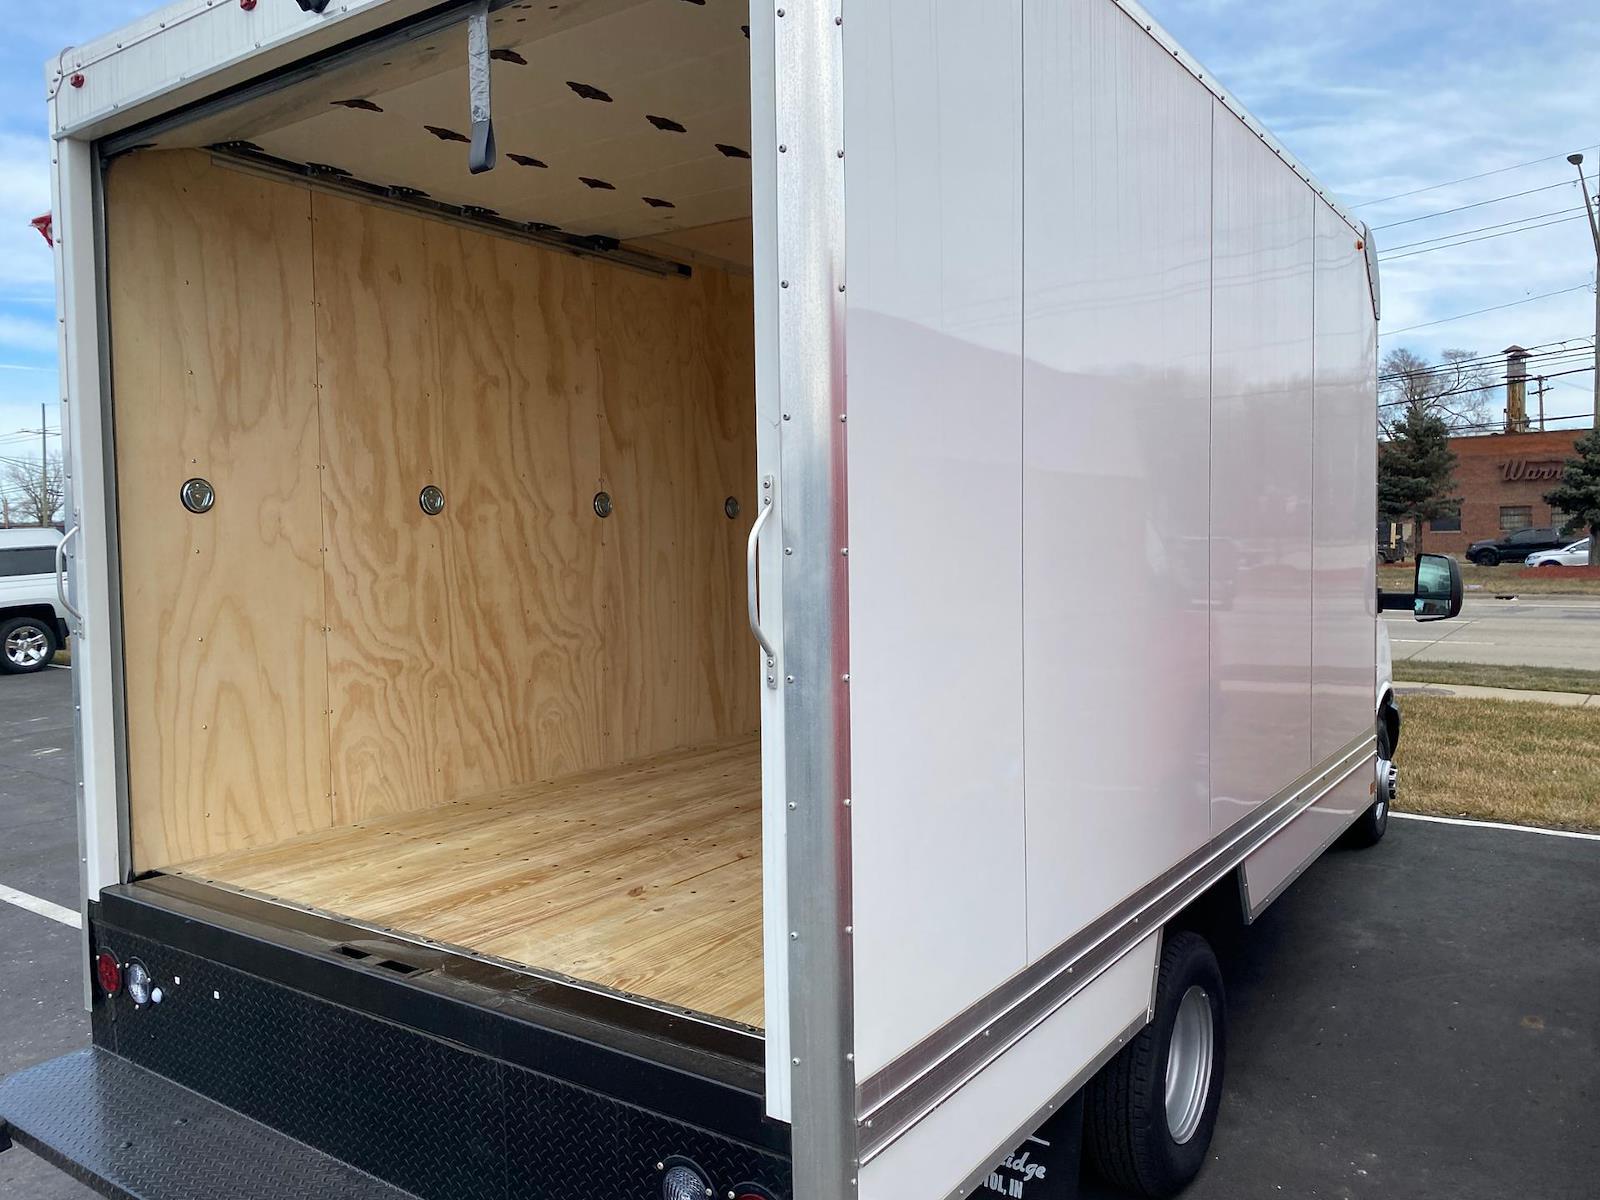 2020 Chevrolet Express 3500 4x2, Cutaway Van #A0369 - photo 3